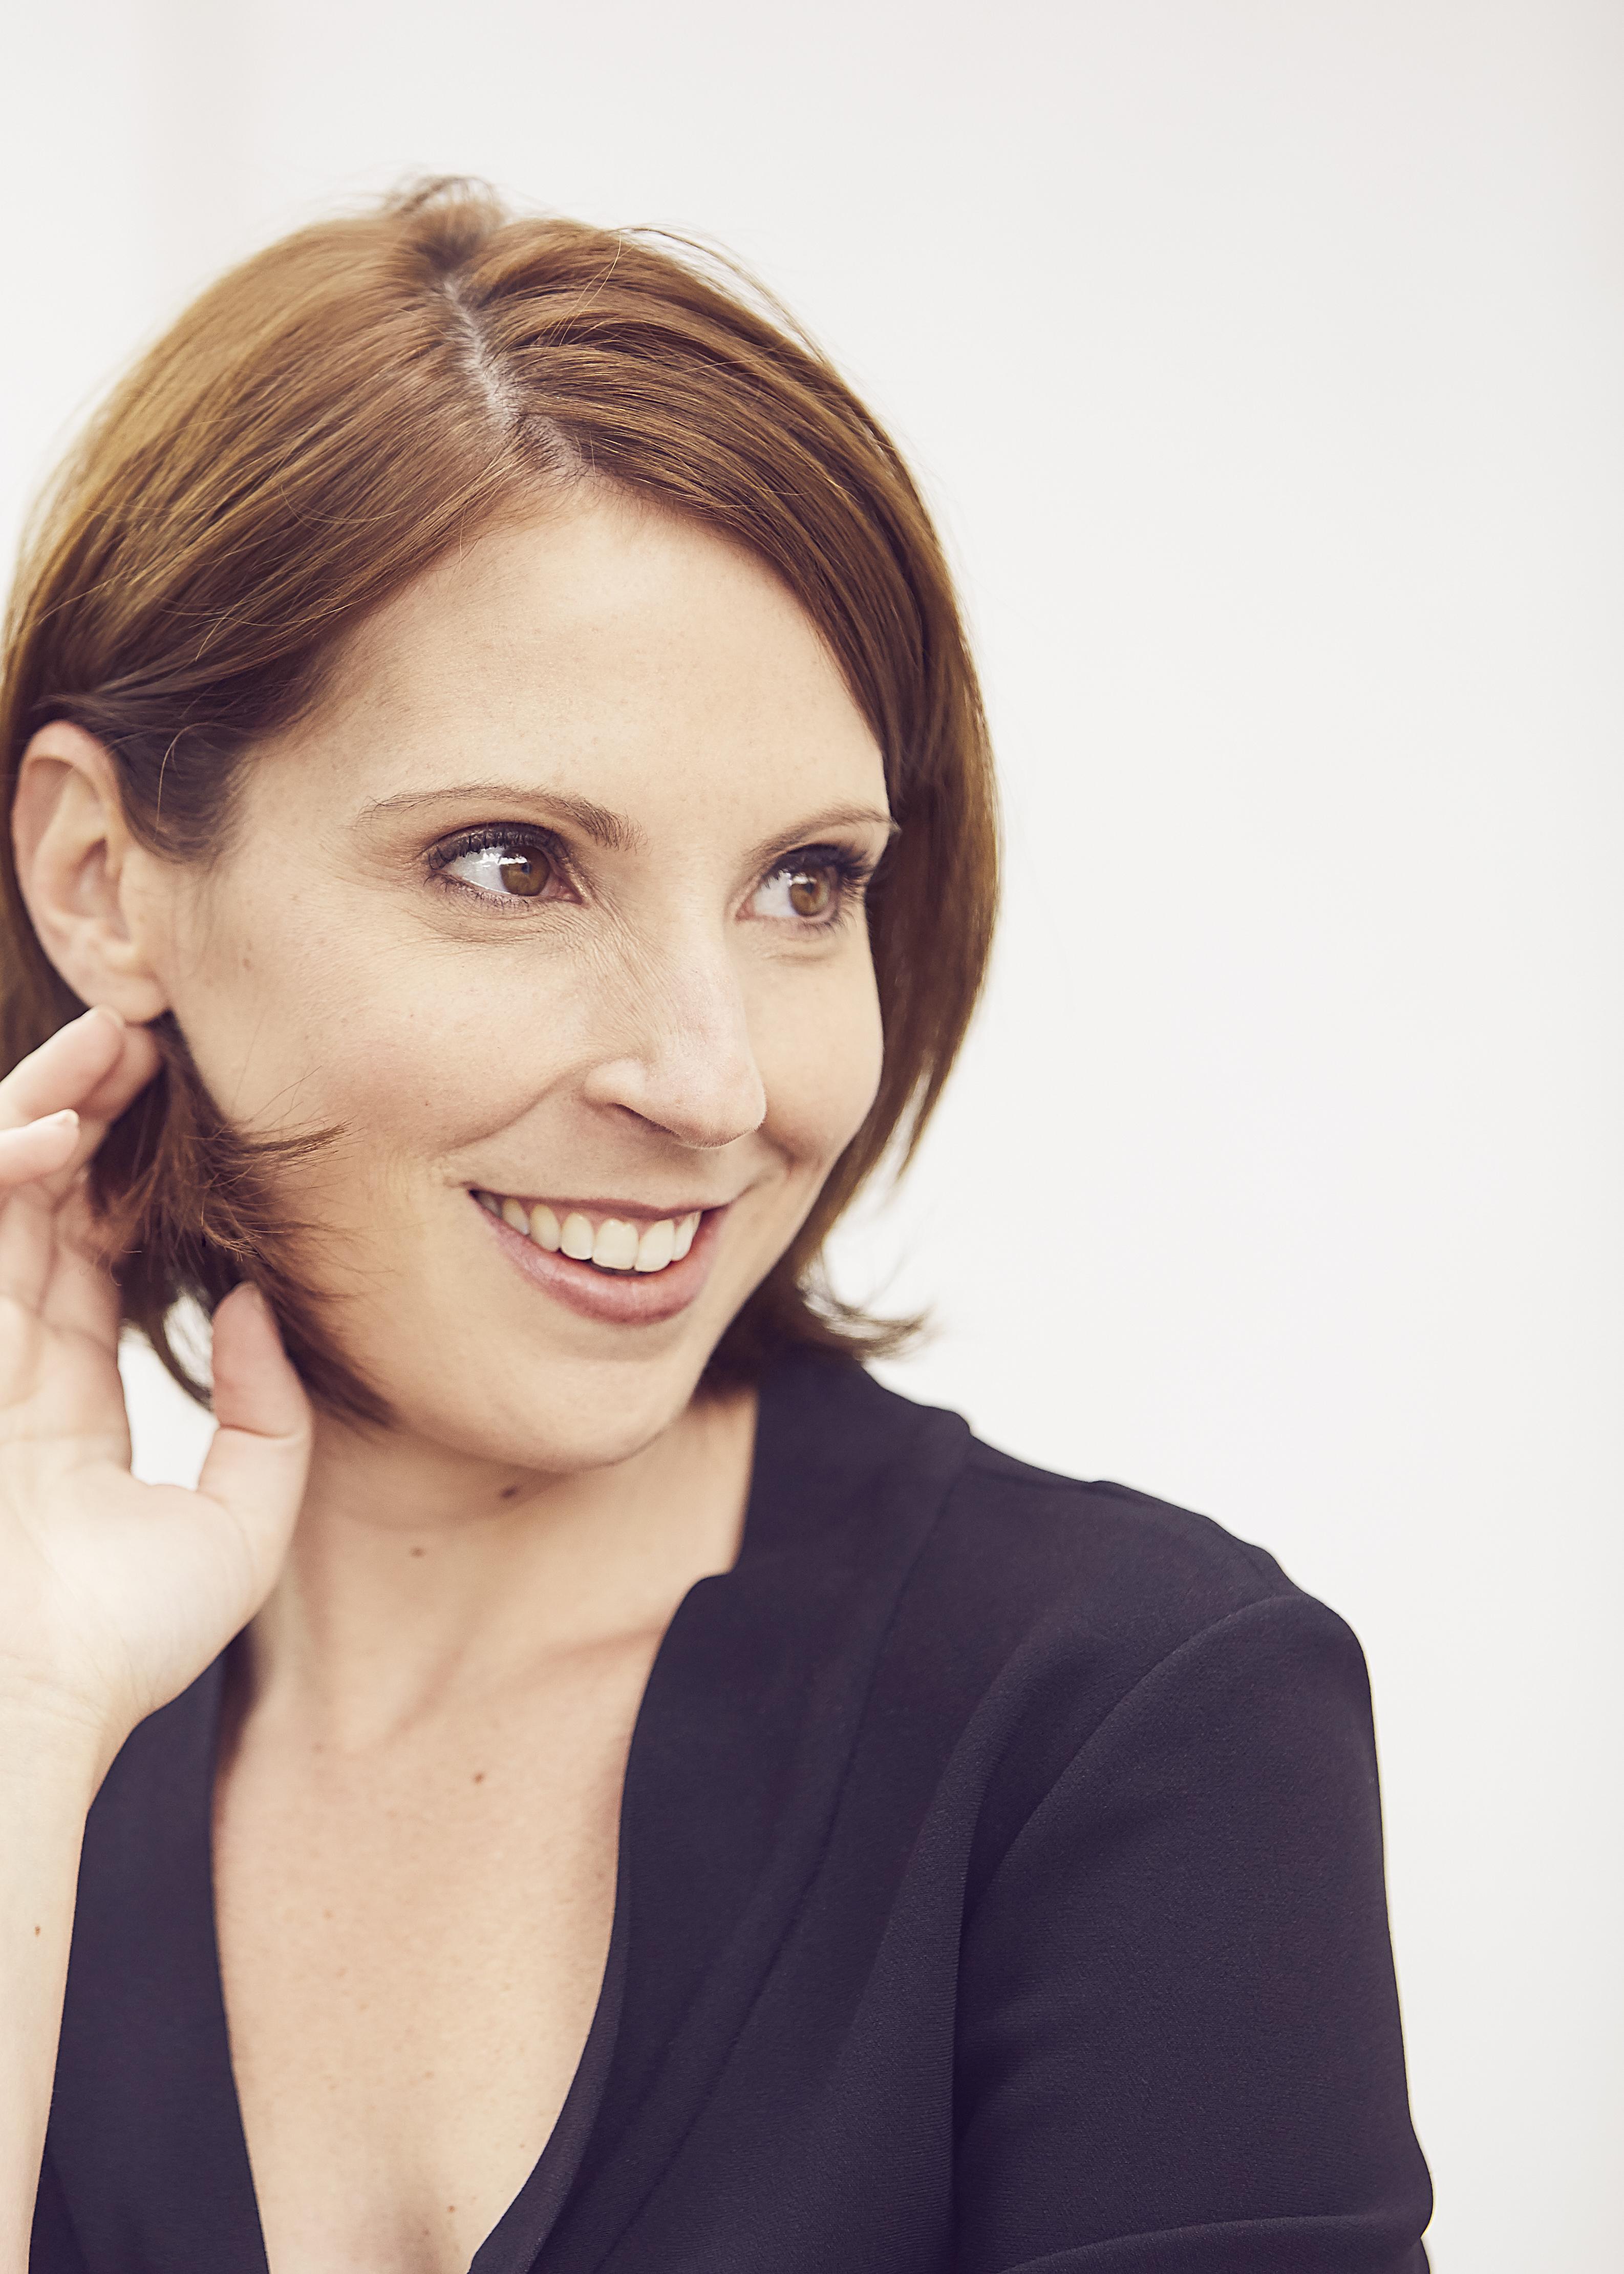 In Highlight - Dr Justine Kluk, Consultant Dermatologist